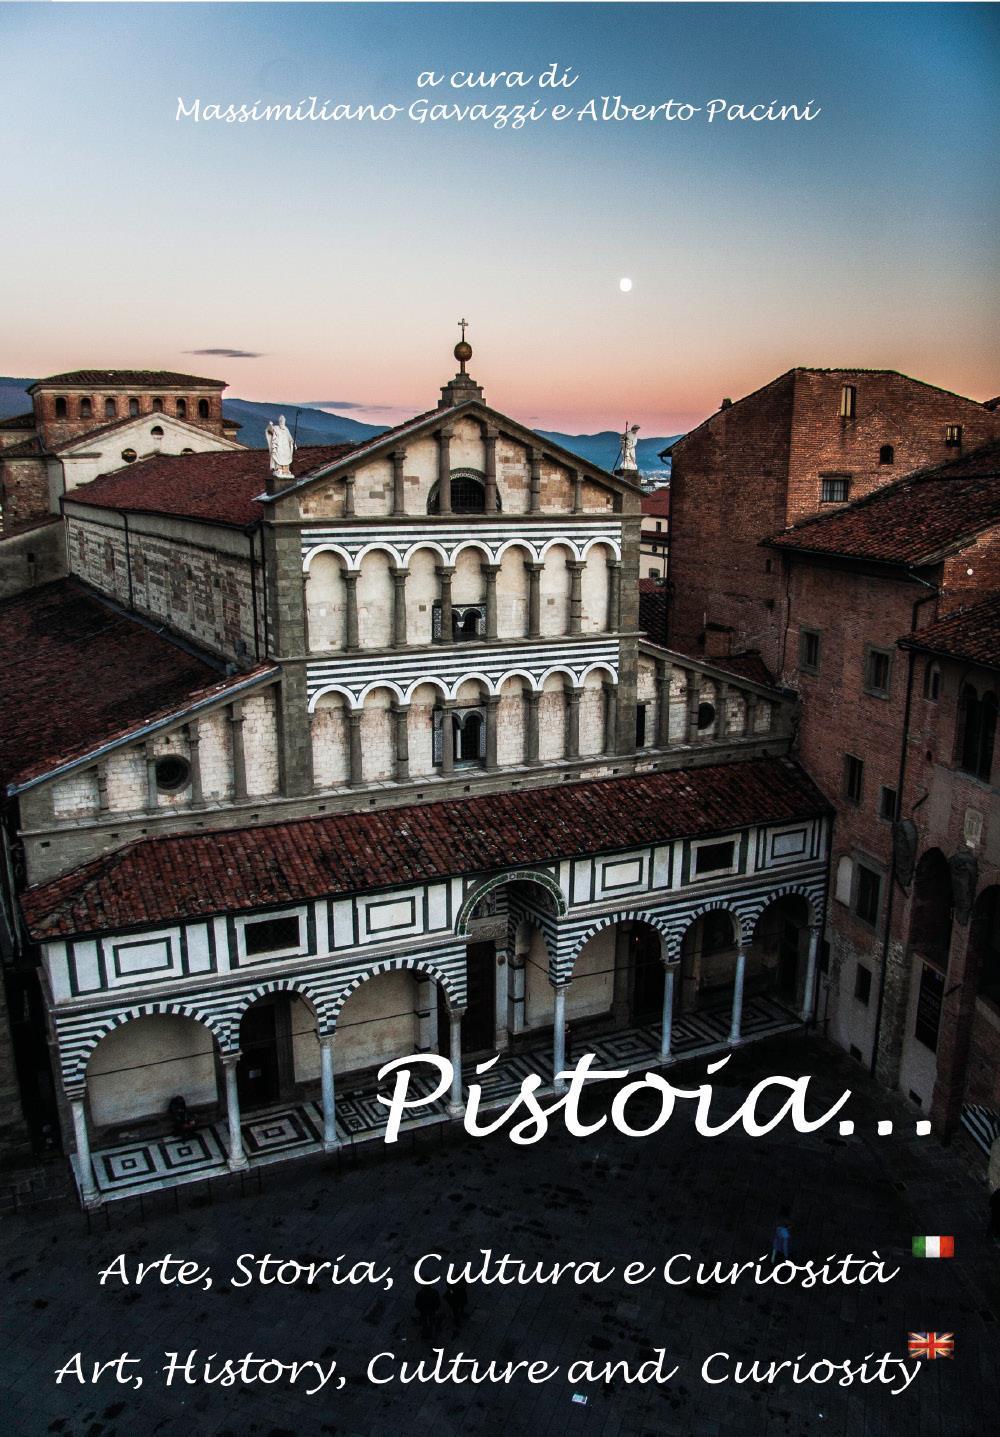 Pistoia...Arte, Storia, Cultura e Curiosità